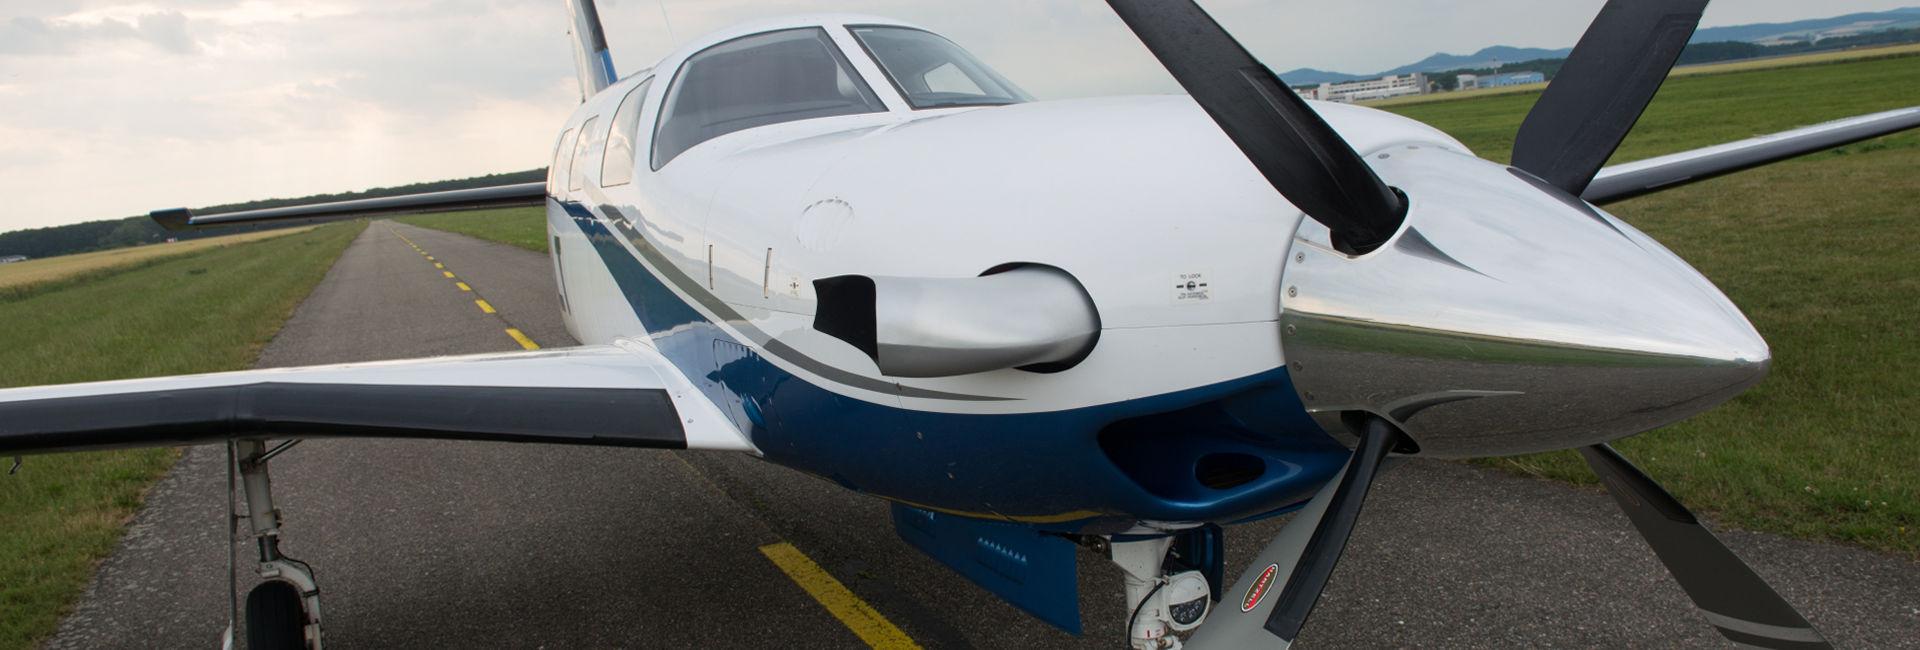 Turbovrtulový letoun Piper Meridian